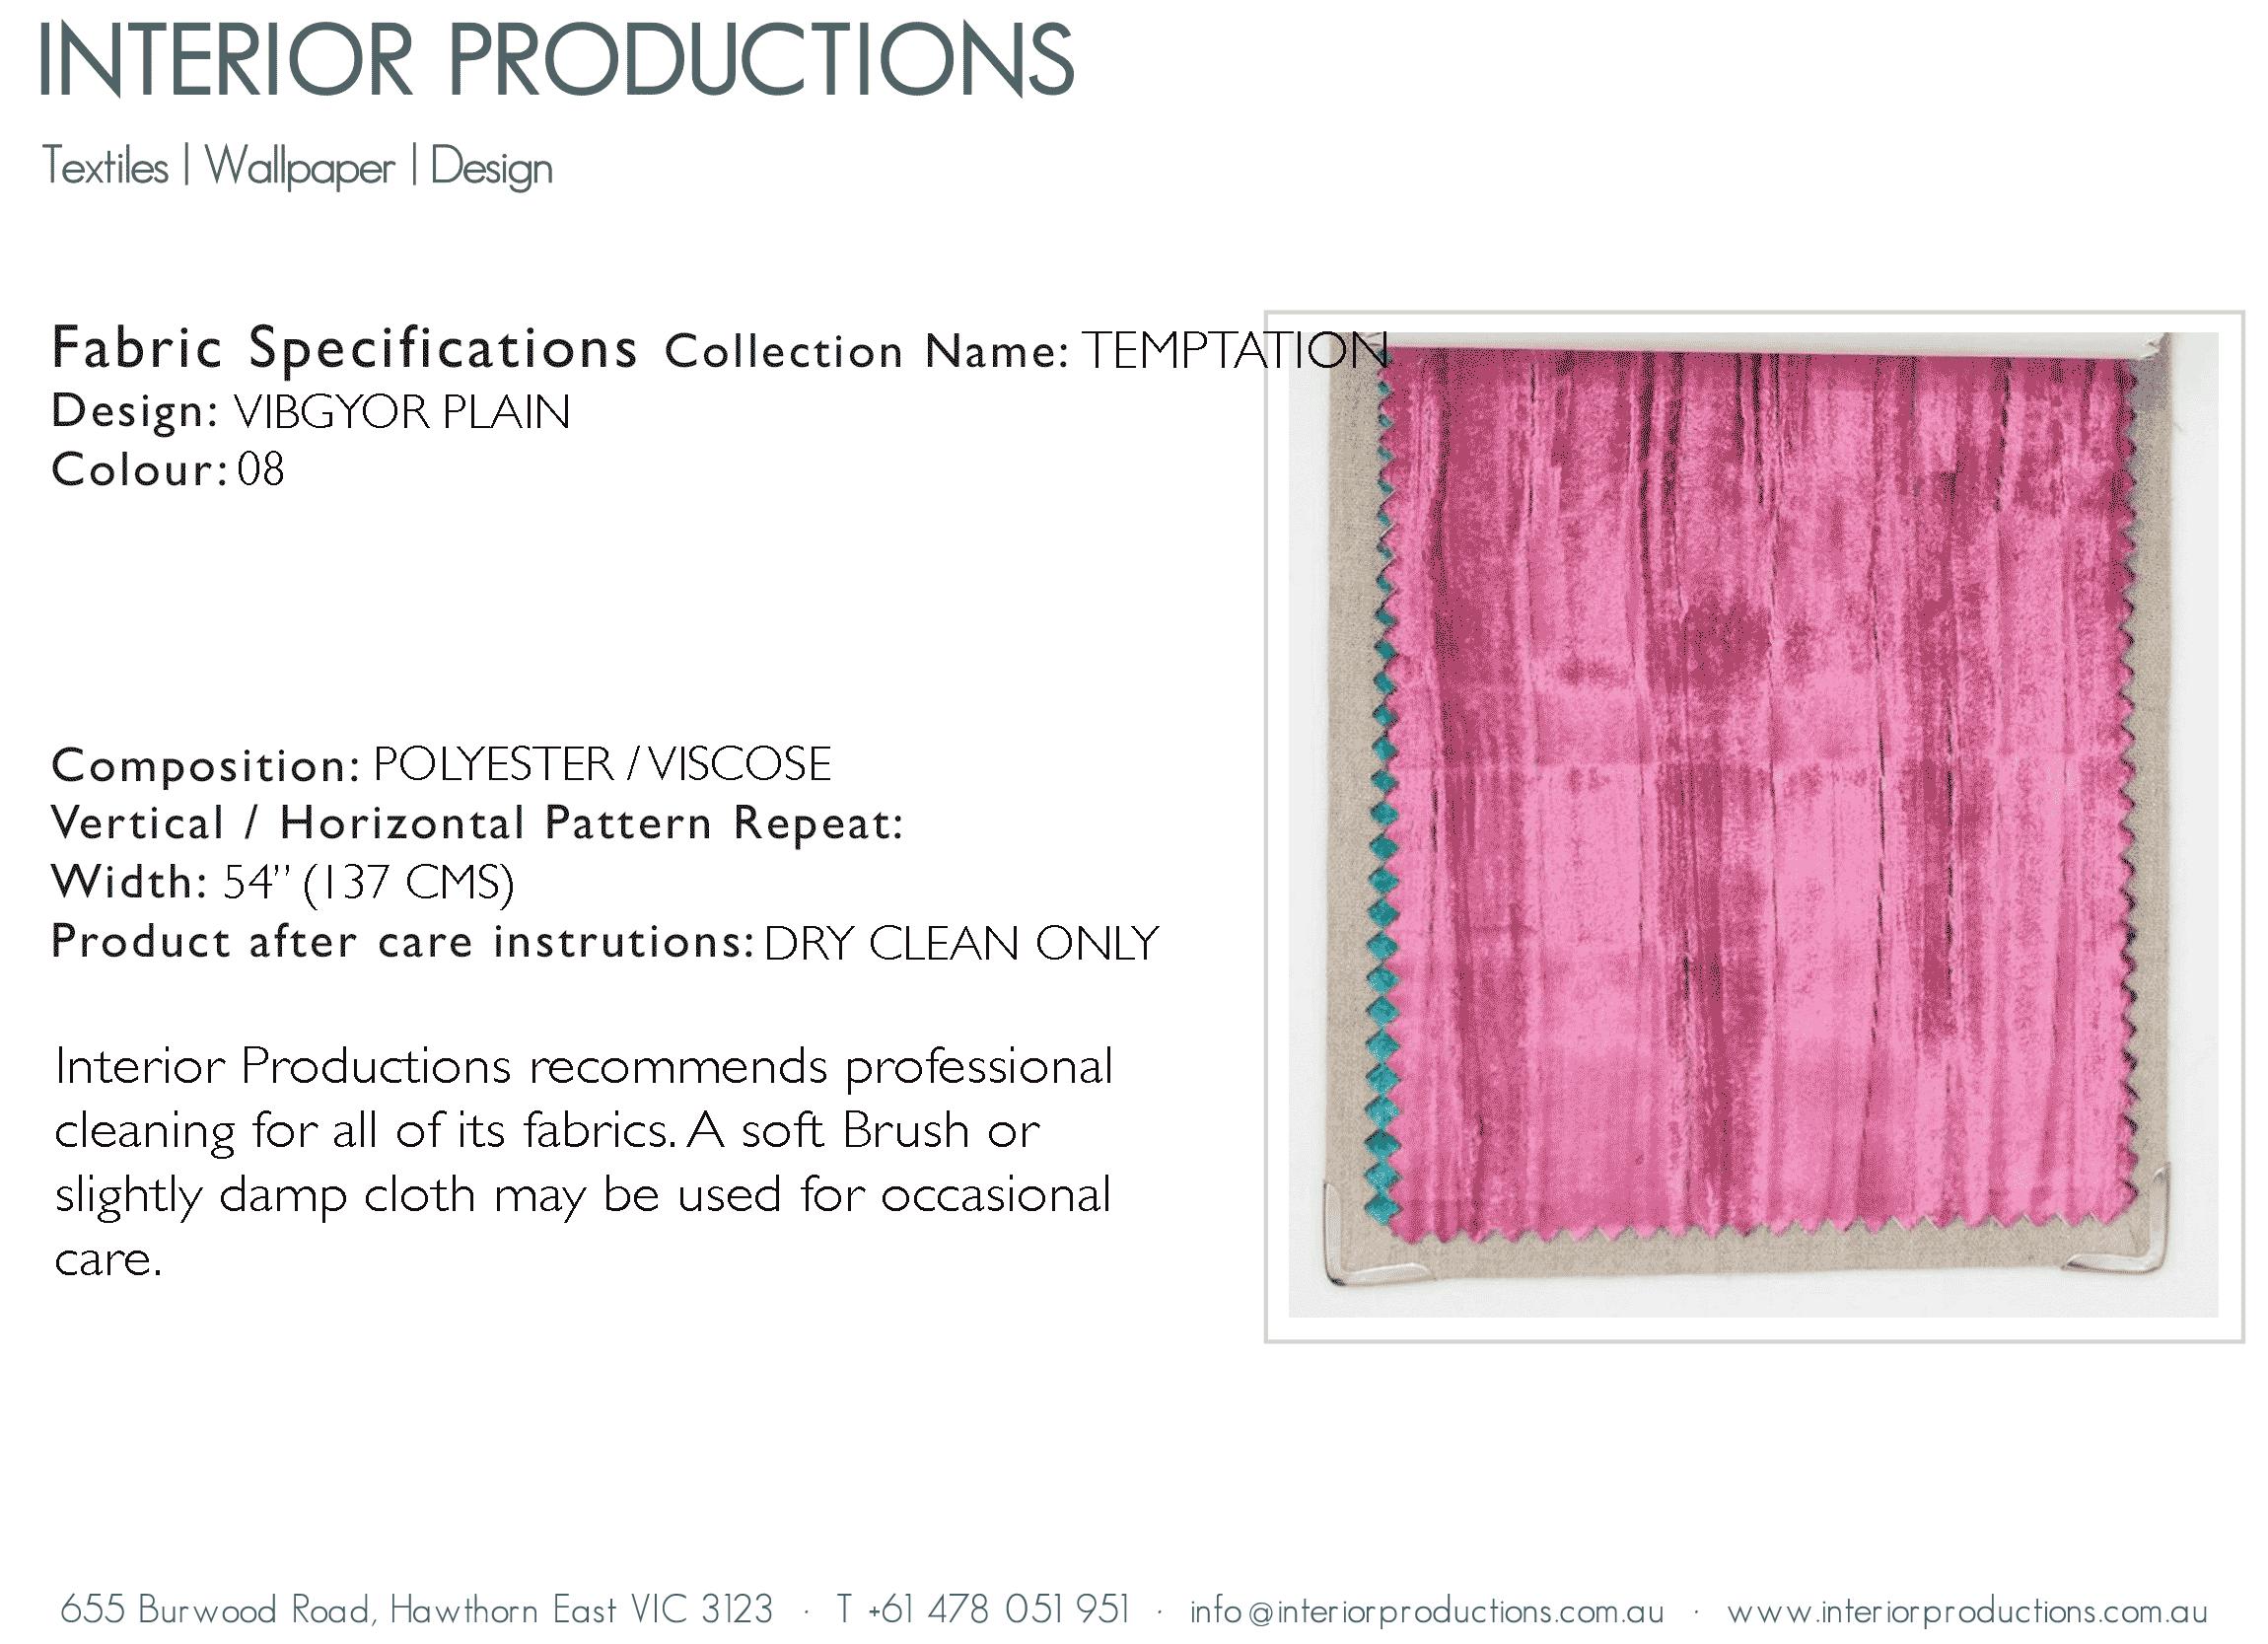 interior_productions_VIBGYOR-PLAIN---08